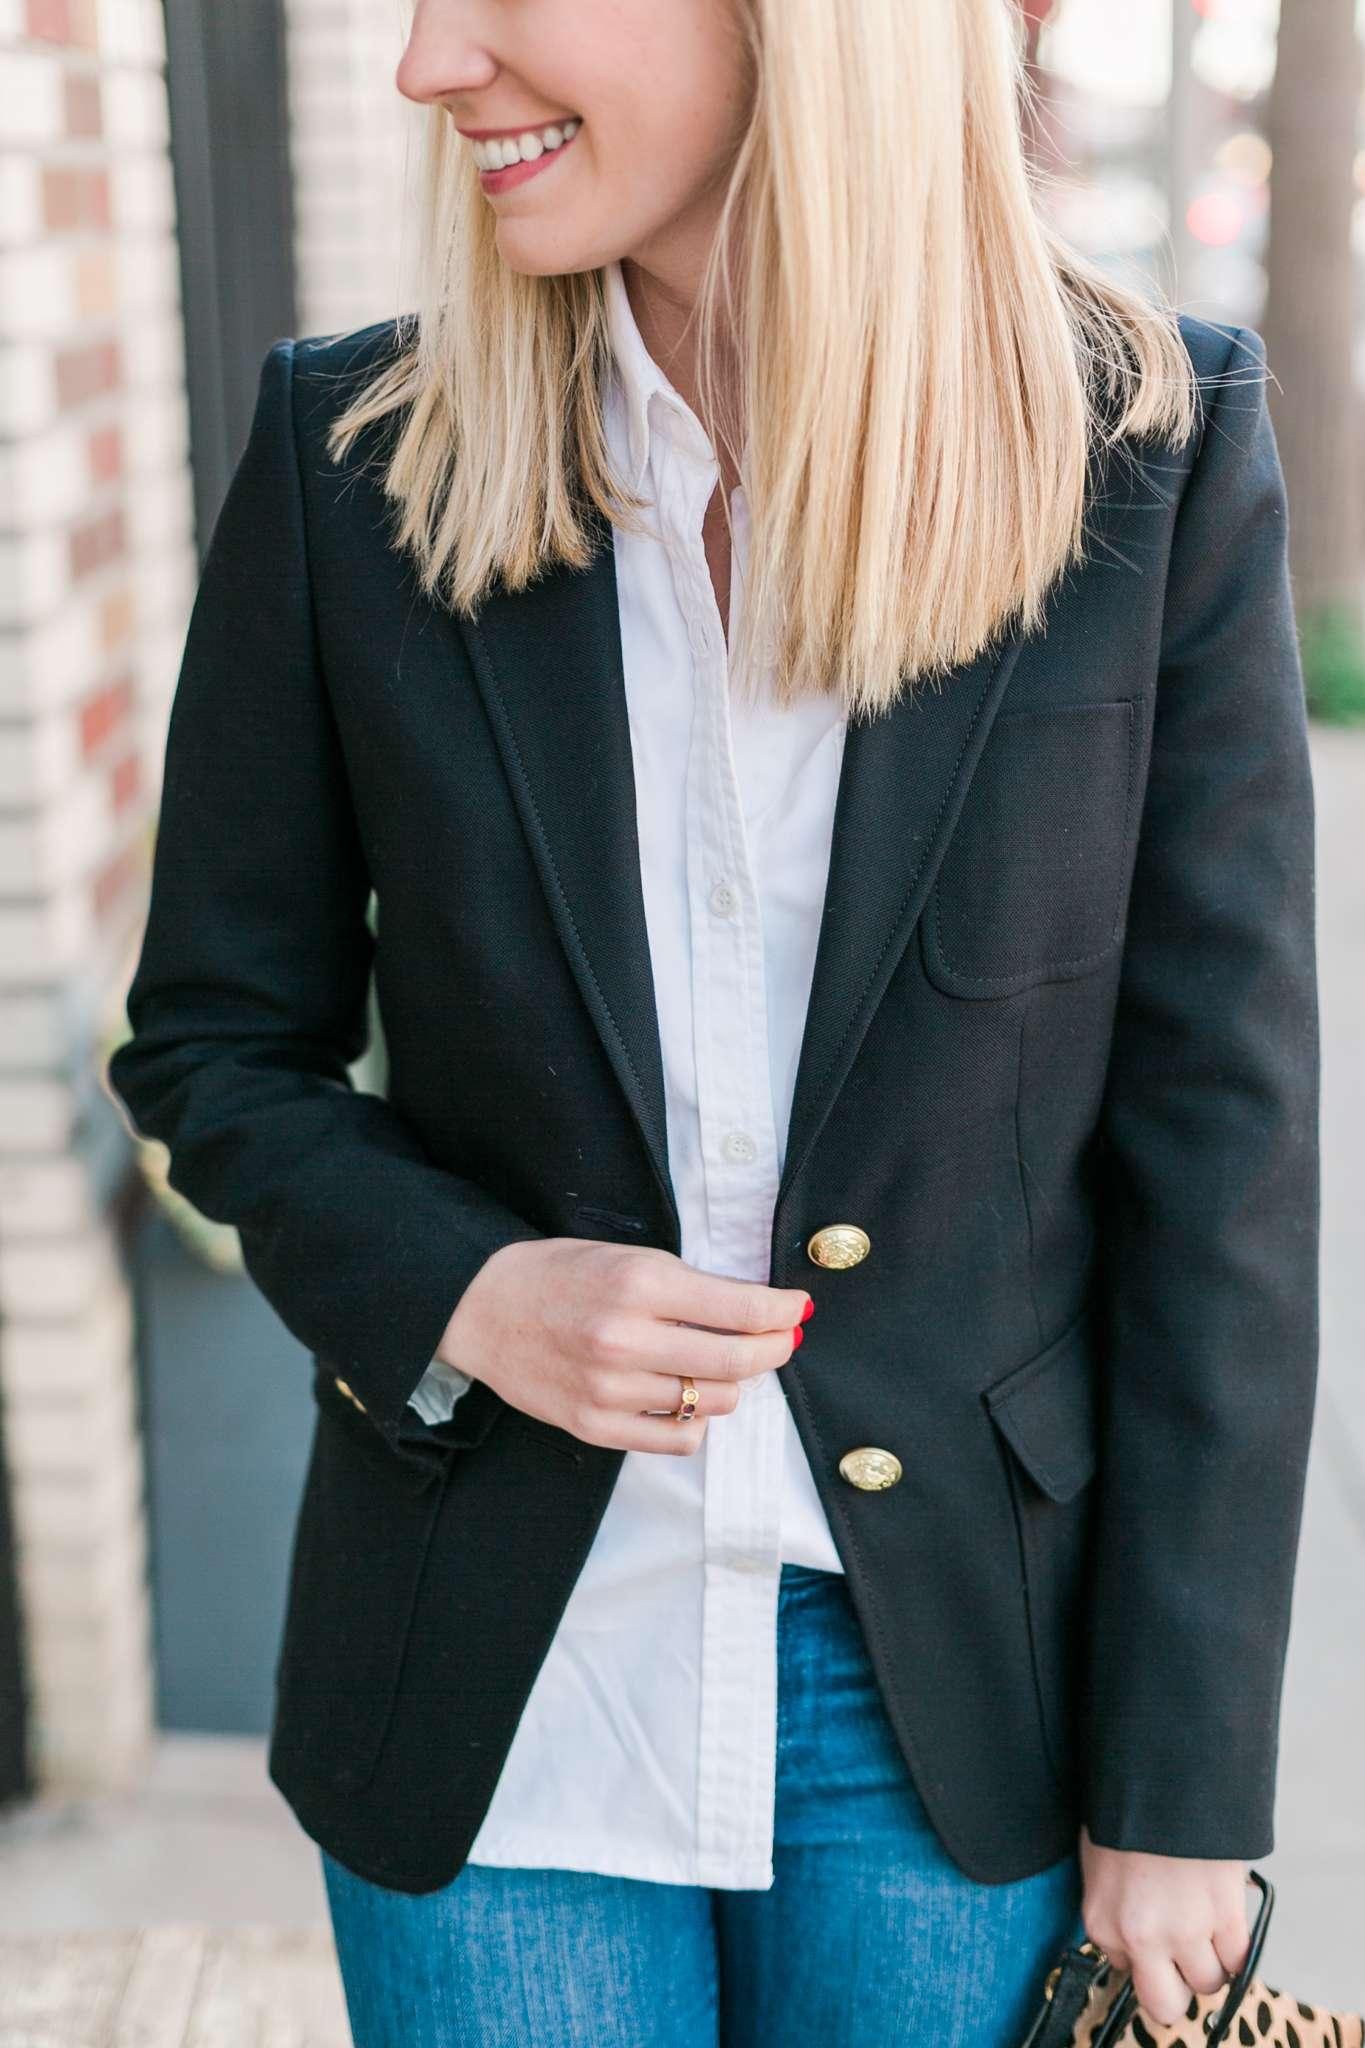 Rhyme & Reason J.Crew Navy Blazer, White Button Down Shirt, Clare V Leopard Clutch, Stuart Weitzman OTK Suede Boots Fashion Outfit